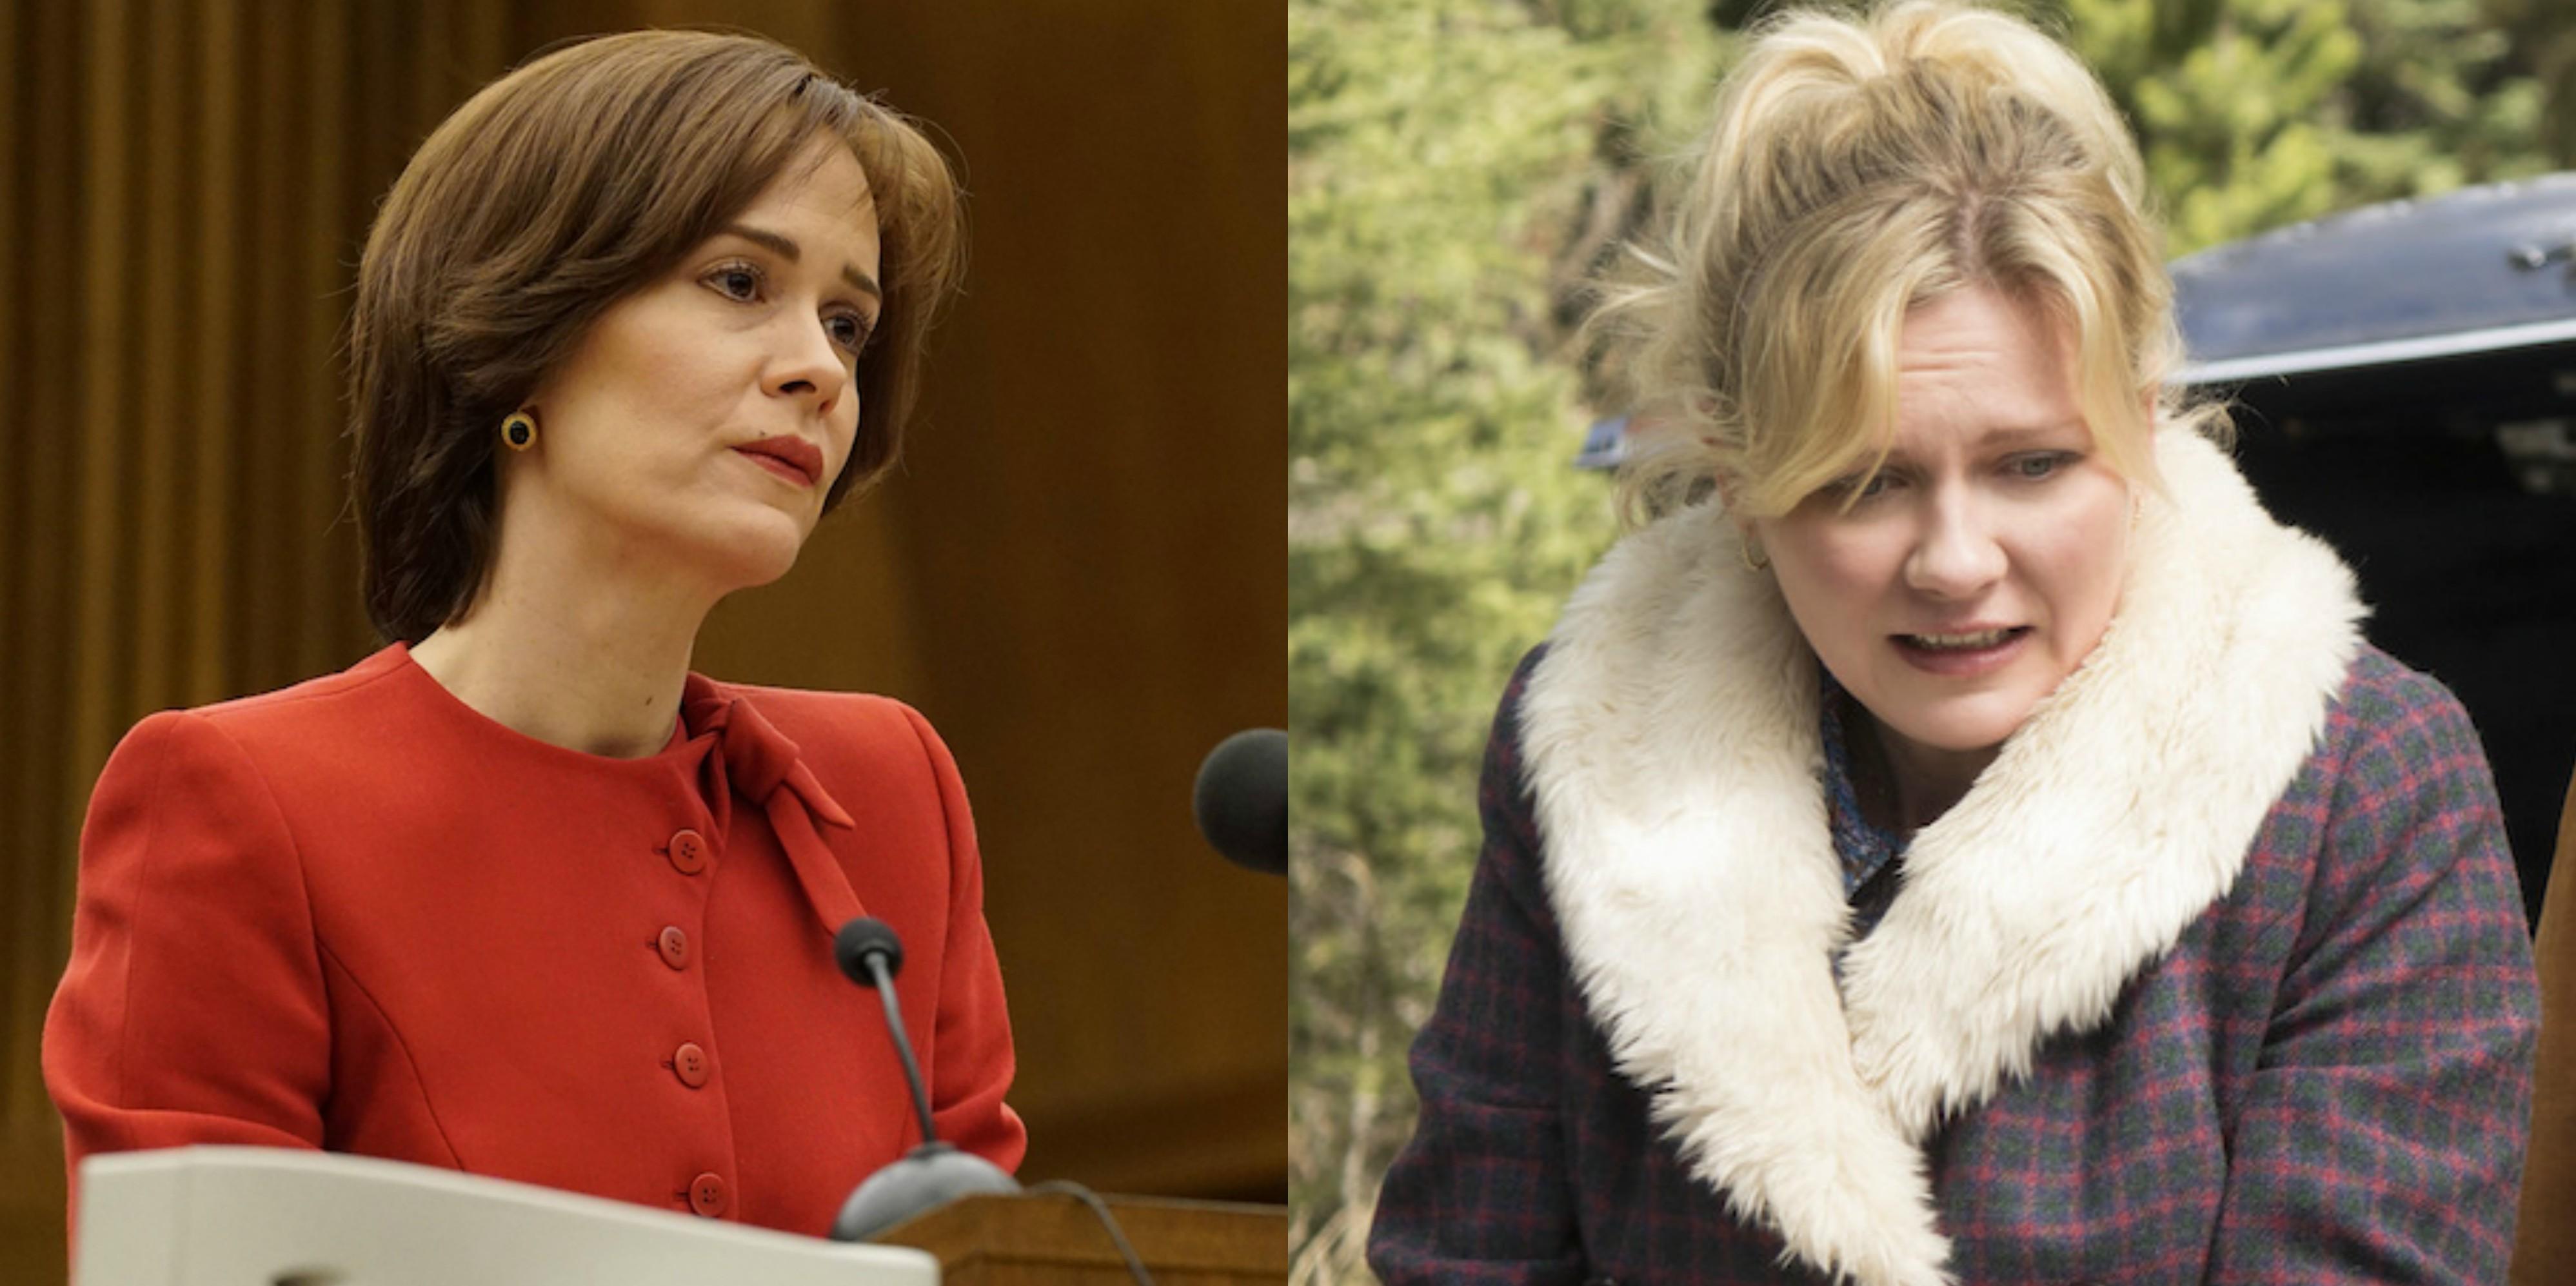 Sarah Paulson v. Kirsten Dunst - actress